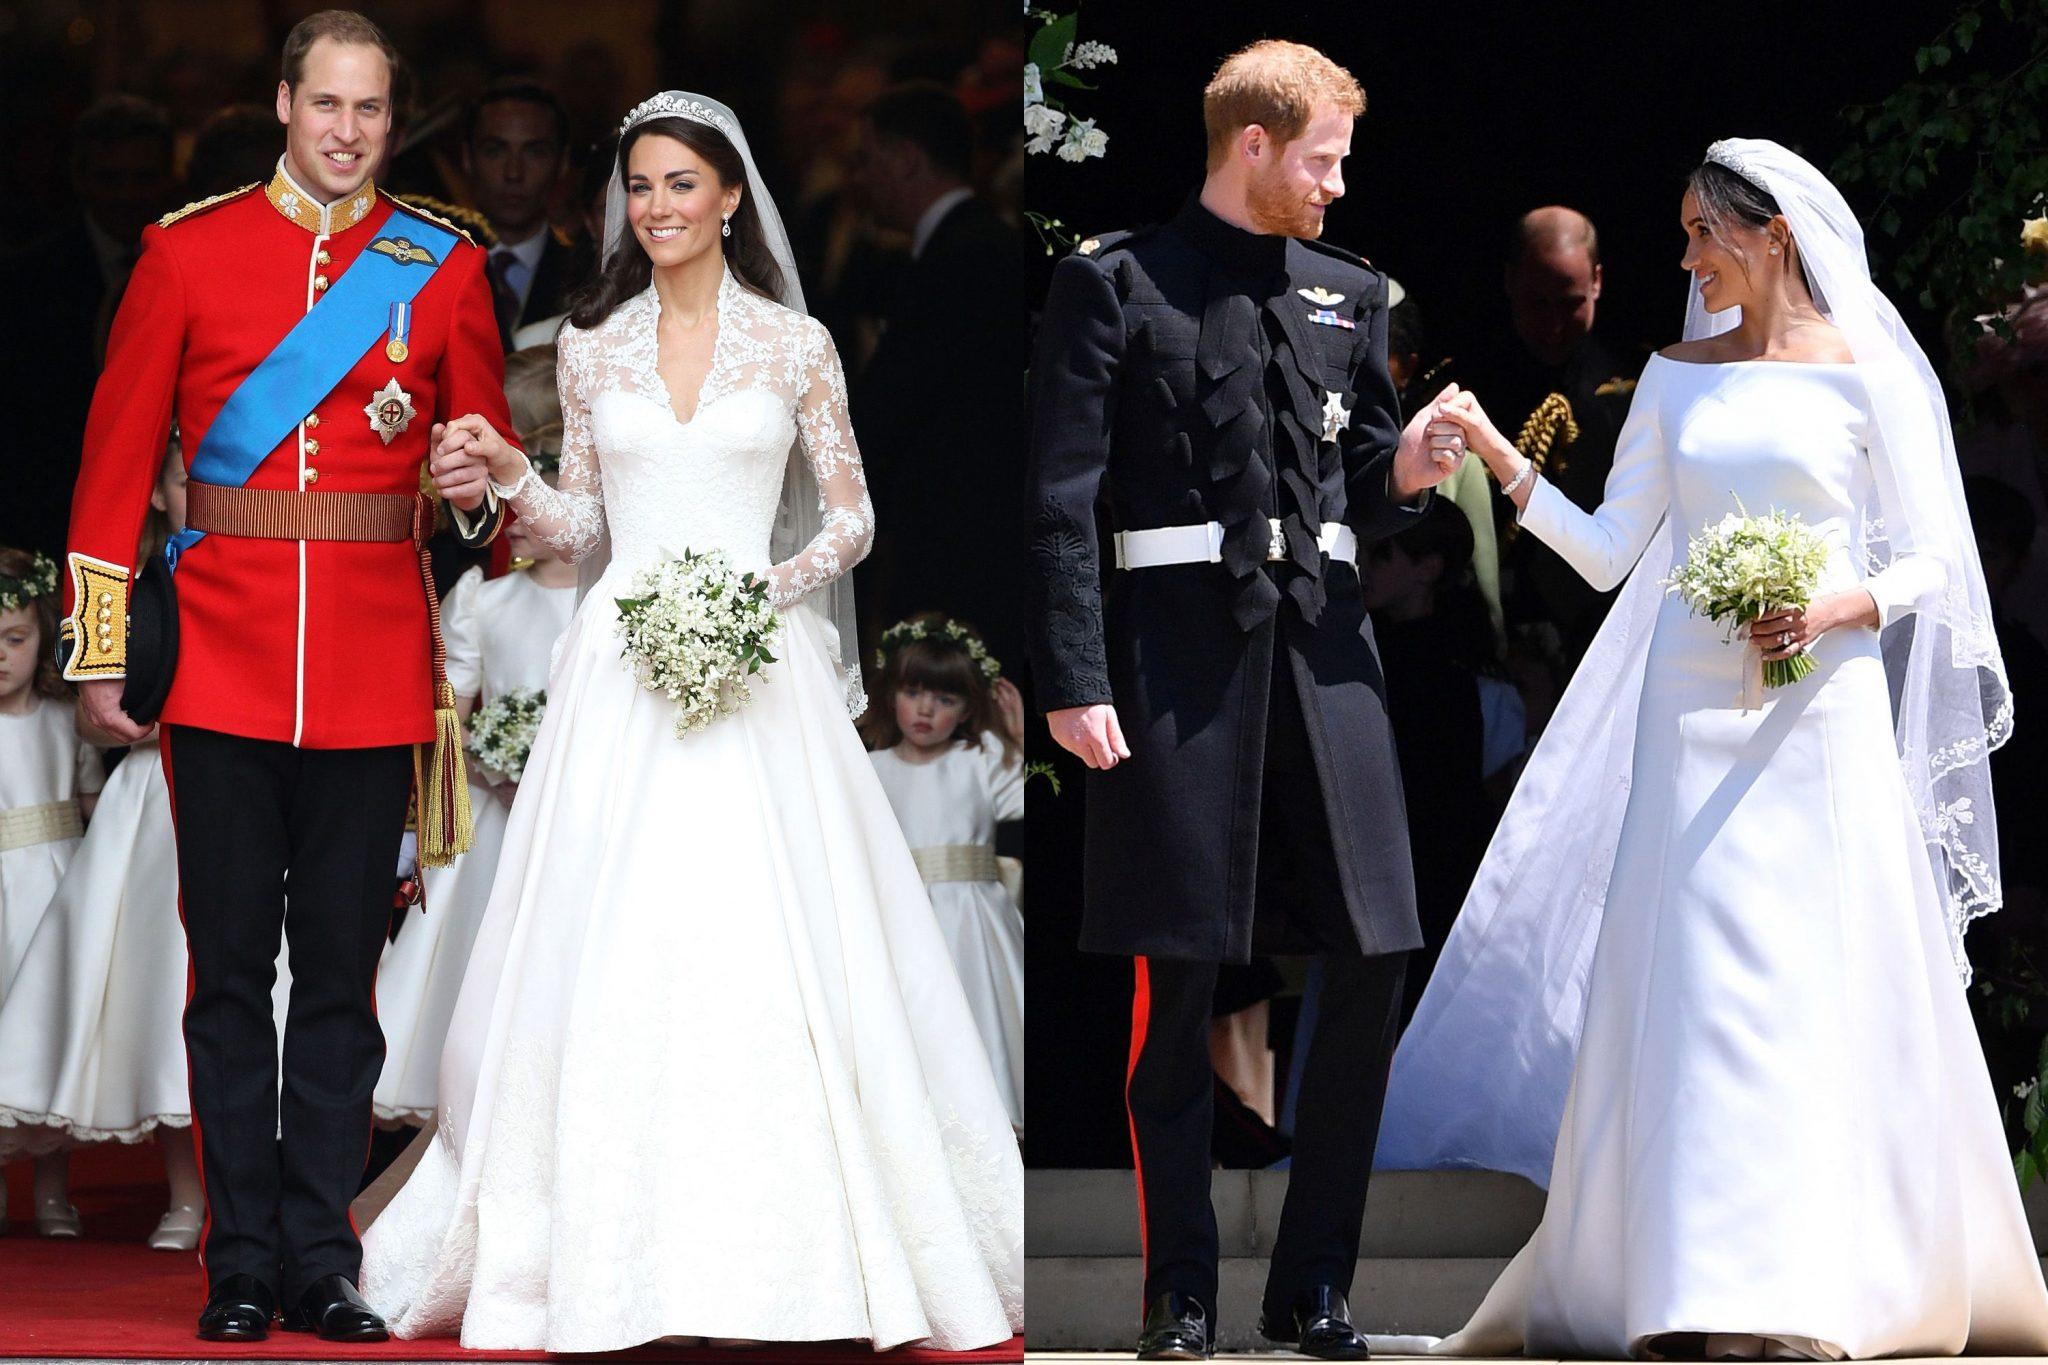 Royal Wedding Dress Debate: Who Wore it Better?